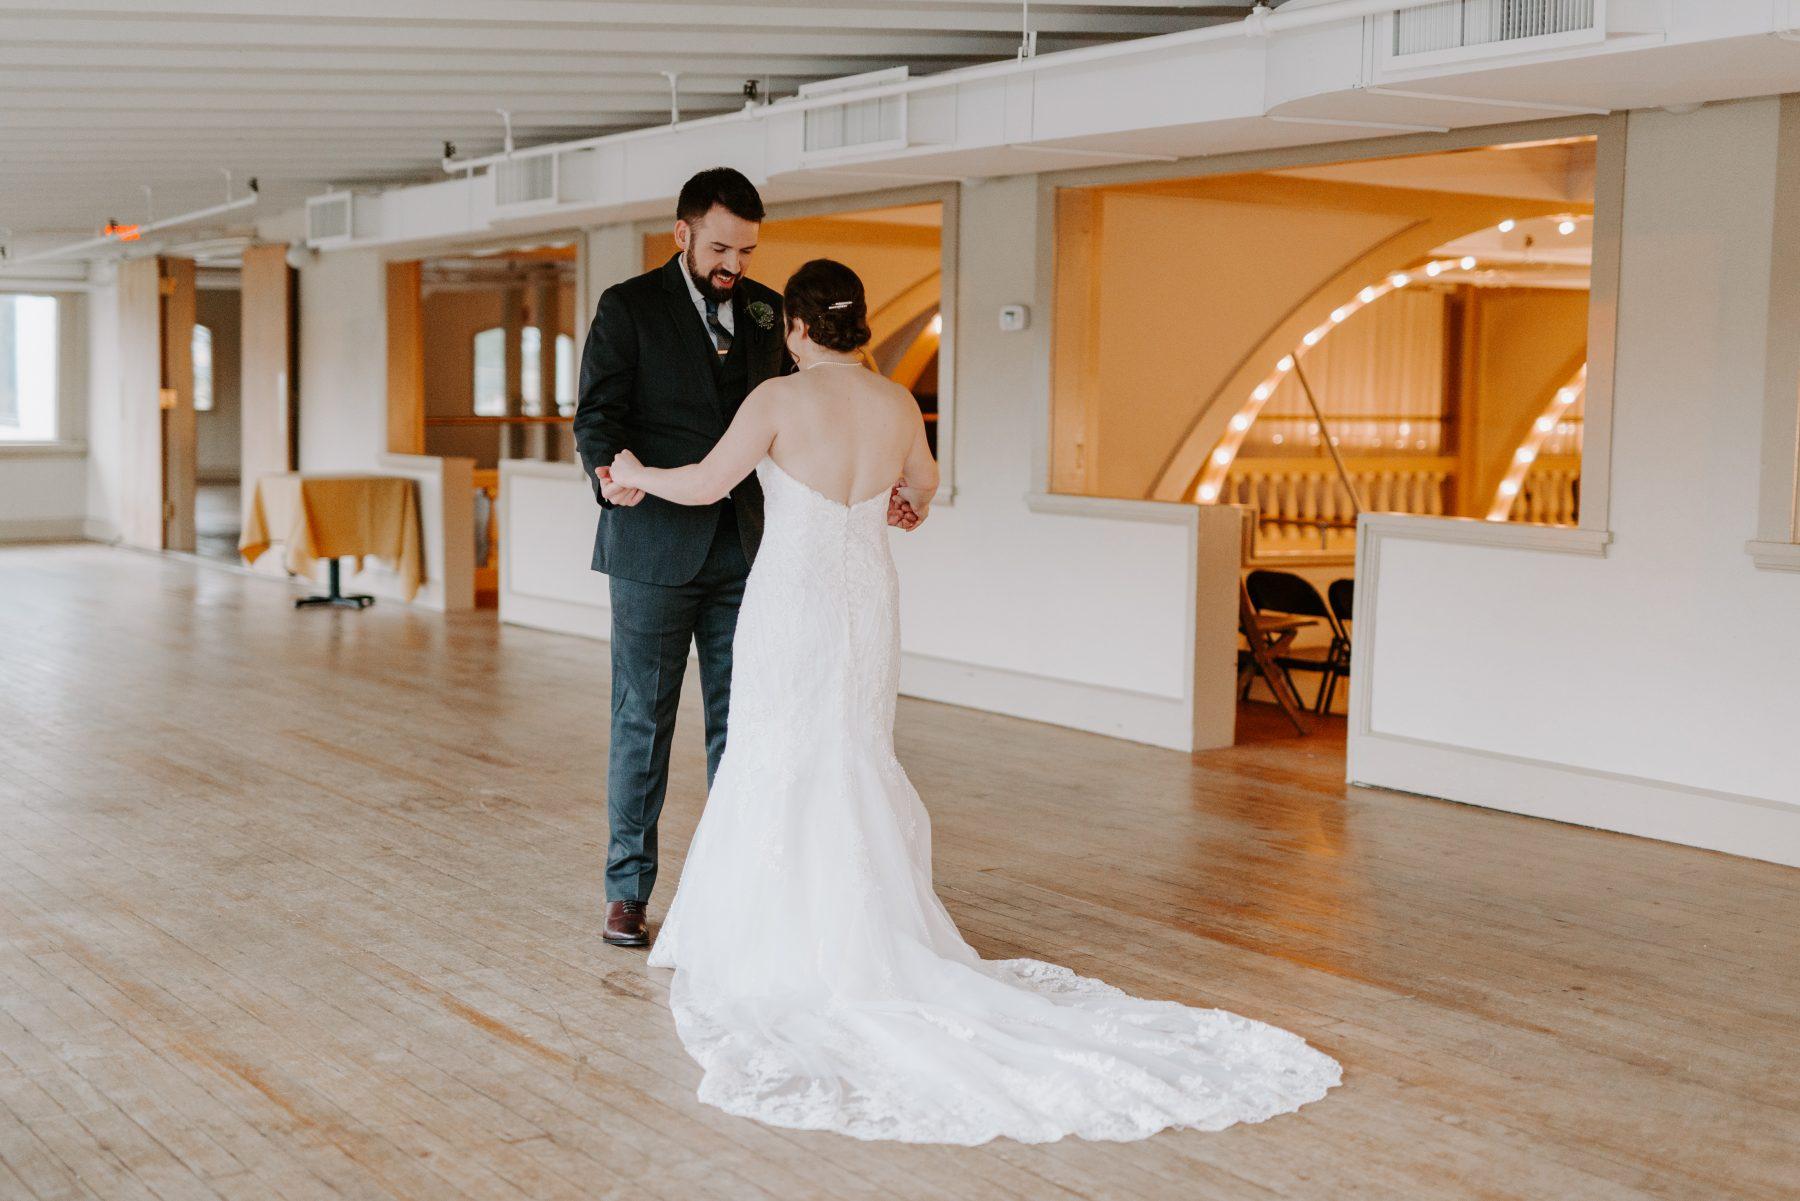 Rhodes on the Pawtuxet Cranston Wedding Ashley and David Blueflash Photography 6